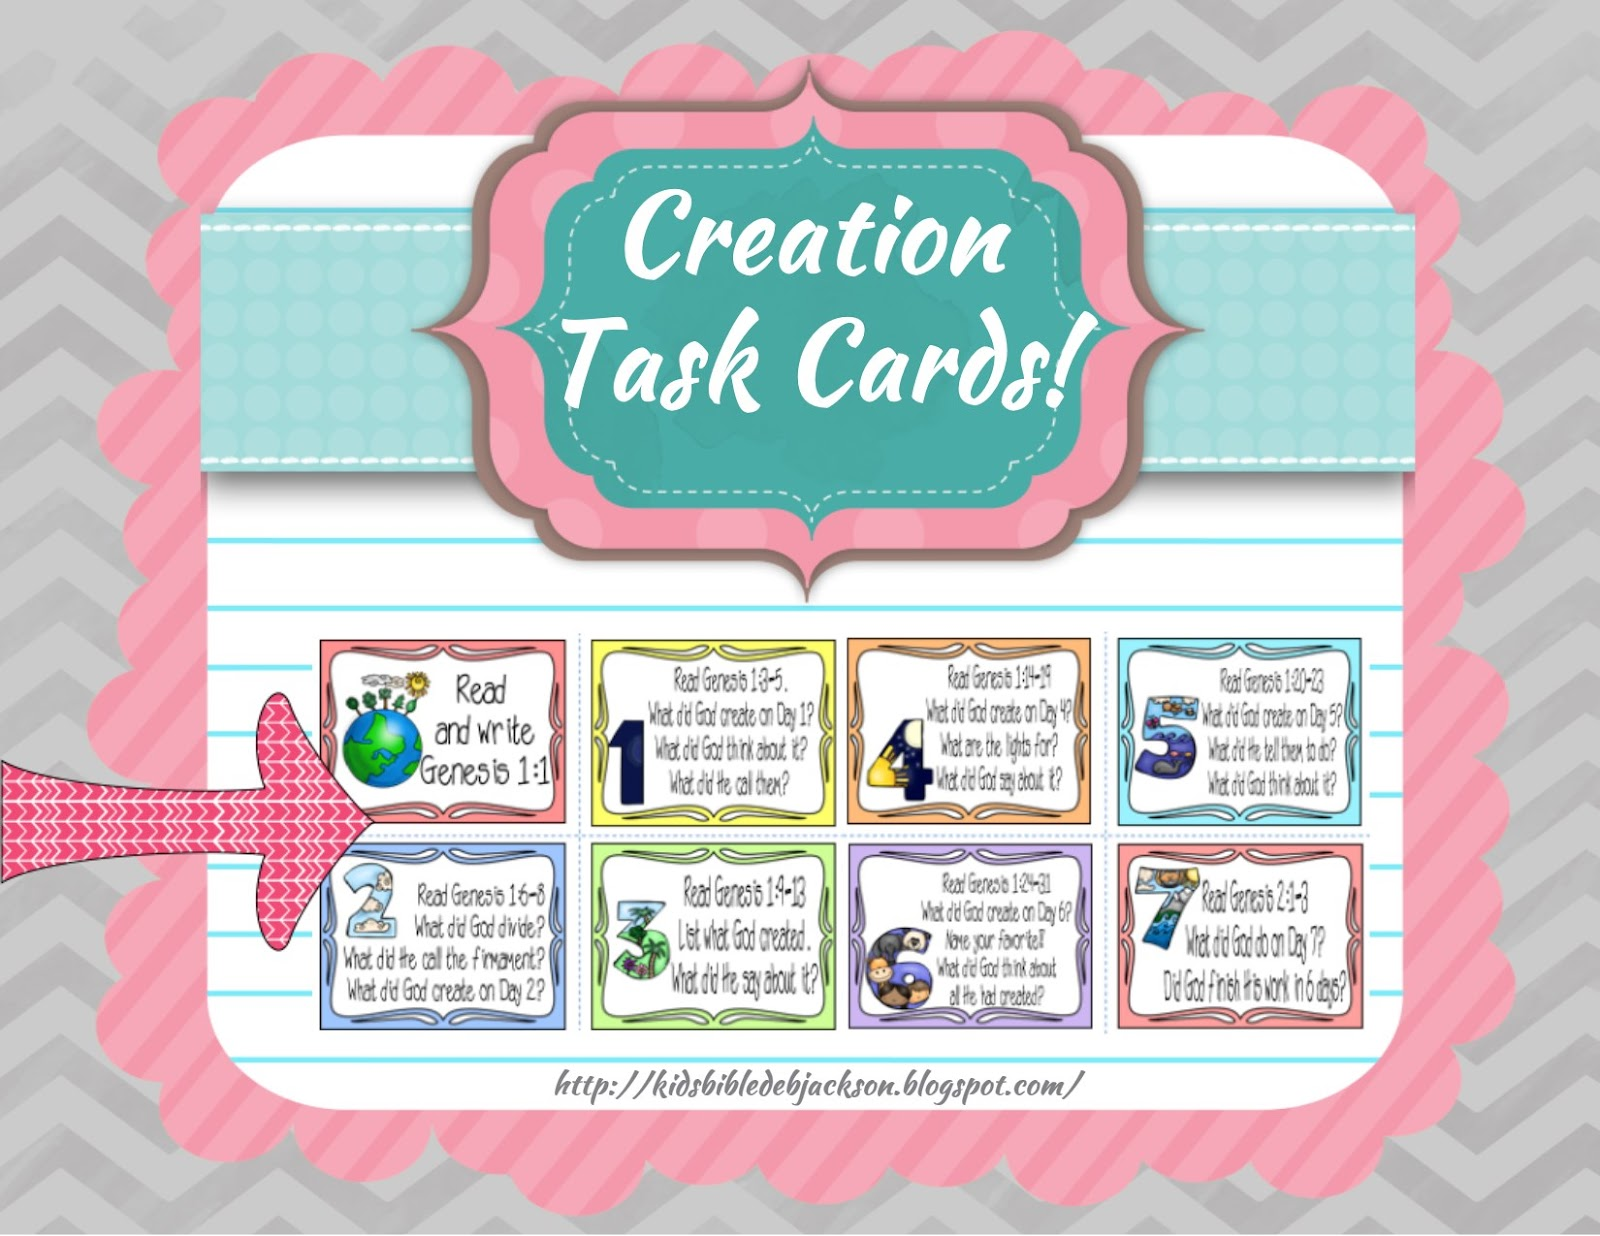 http://kidsbibledebjackson.blogspot.com/2015/01/the-creation-for-kids-day-5.html